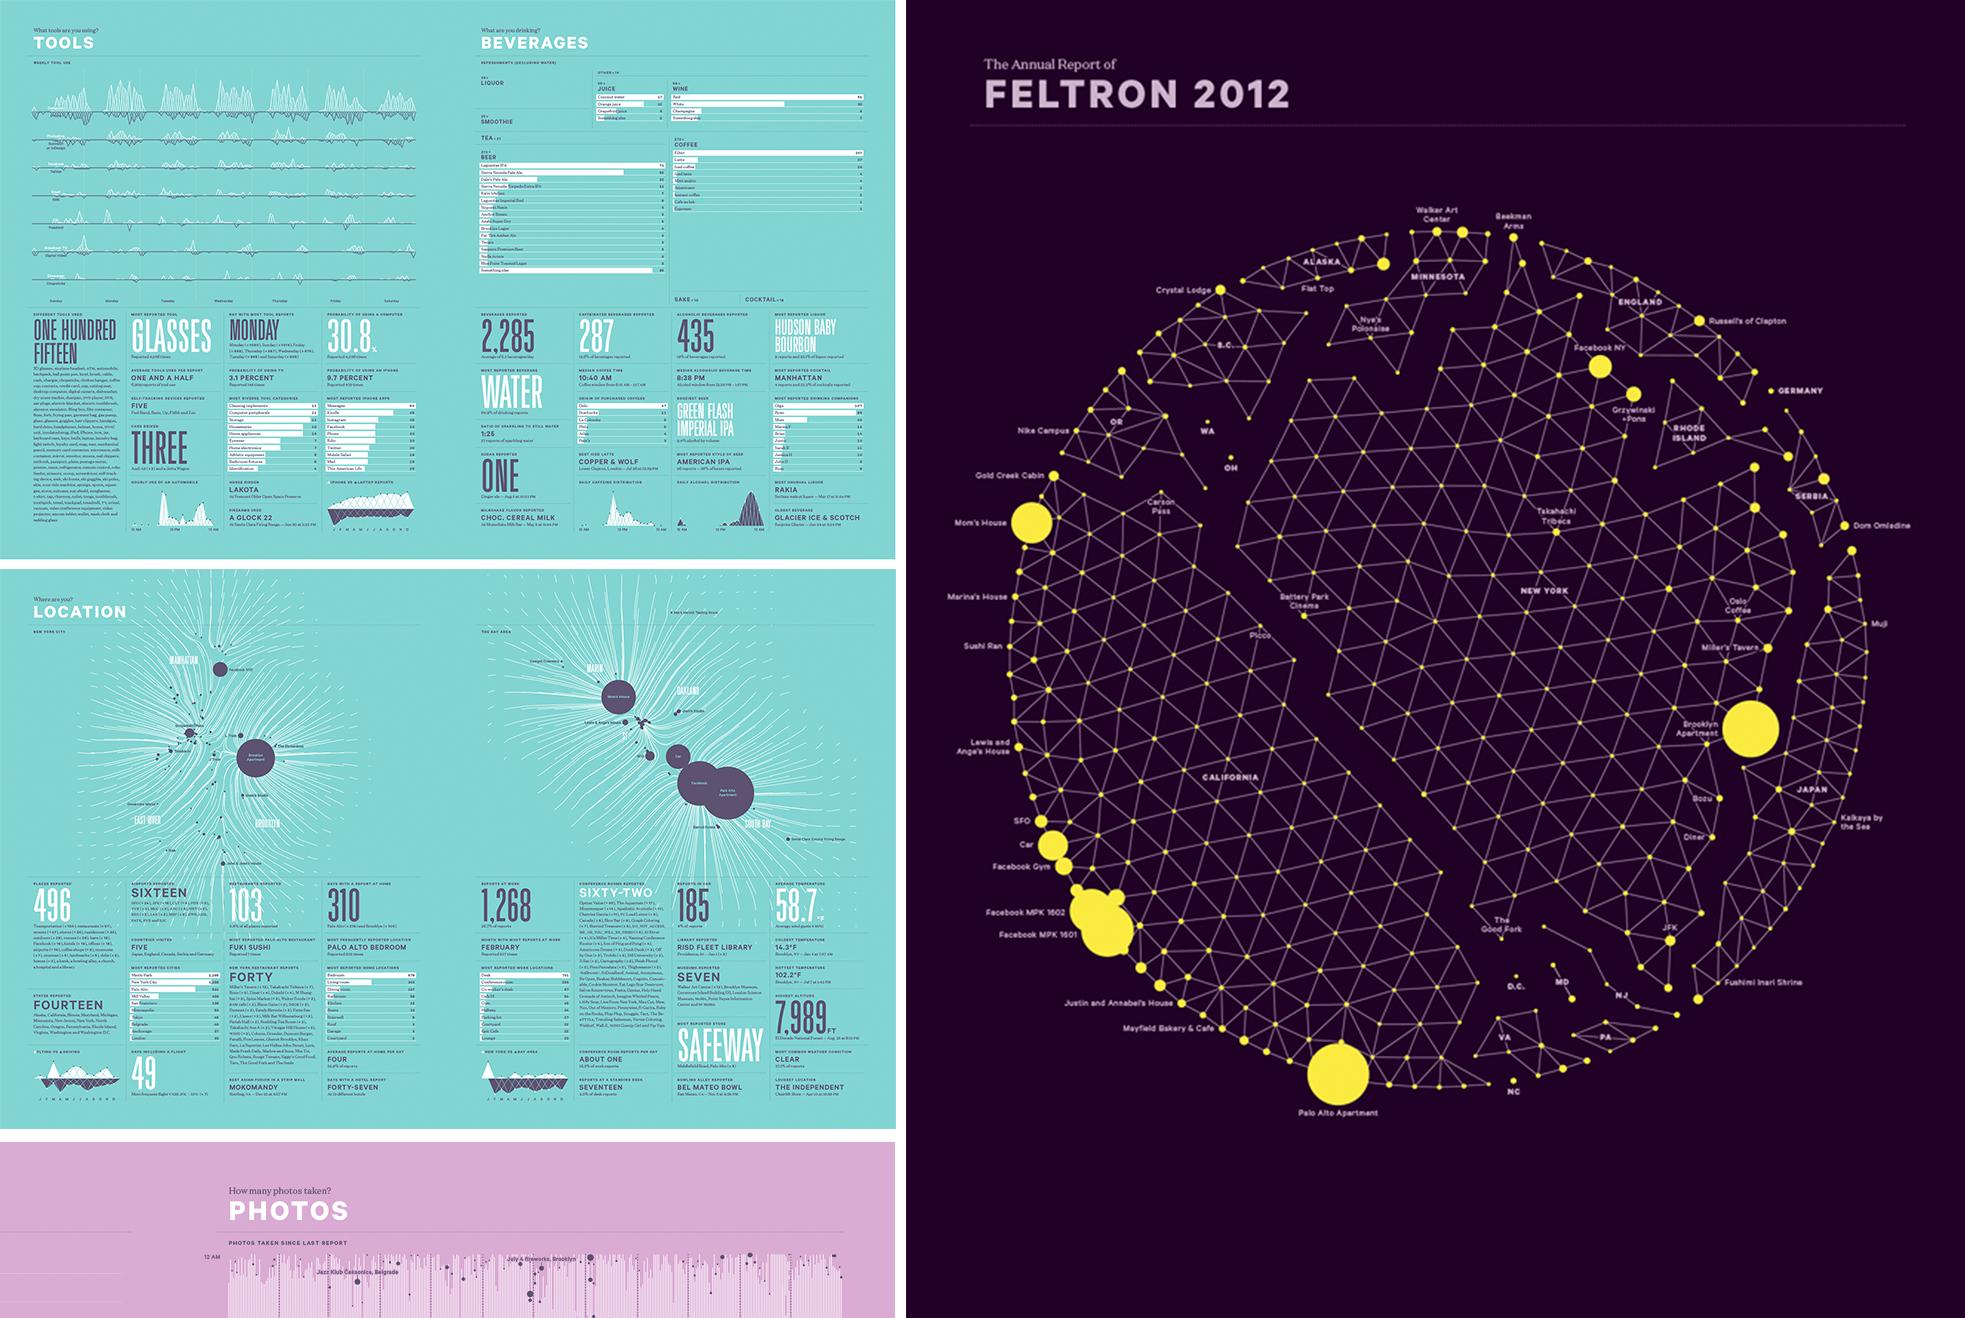 feltron-2012